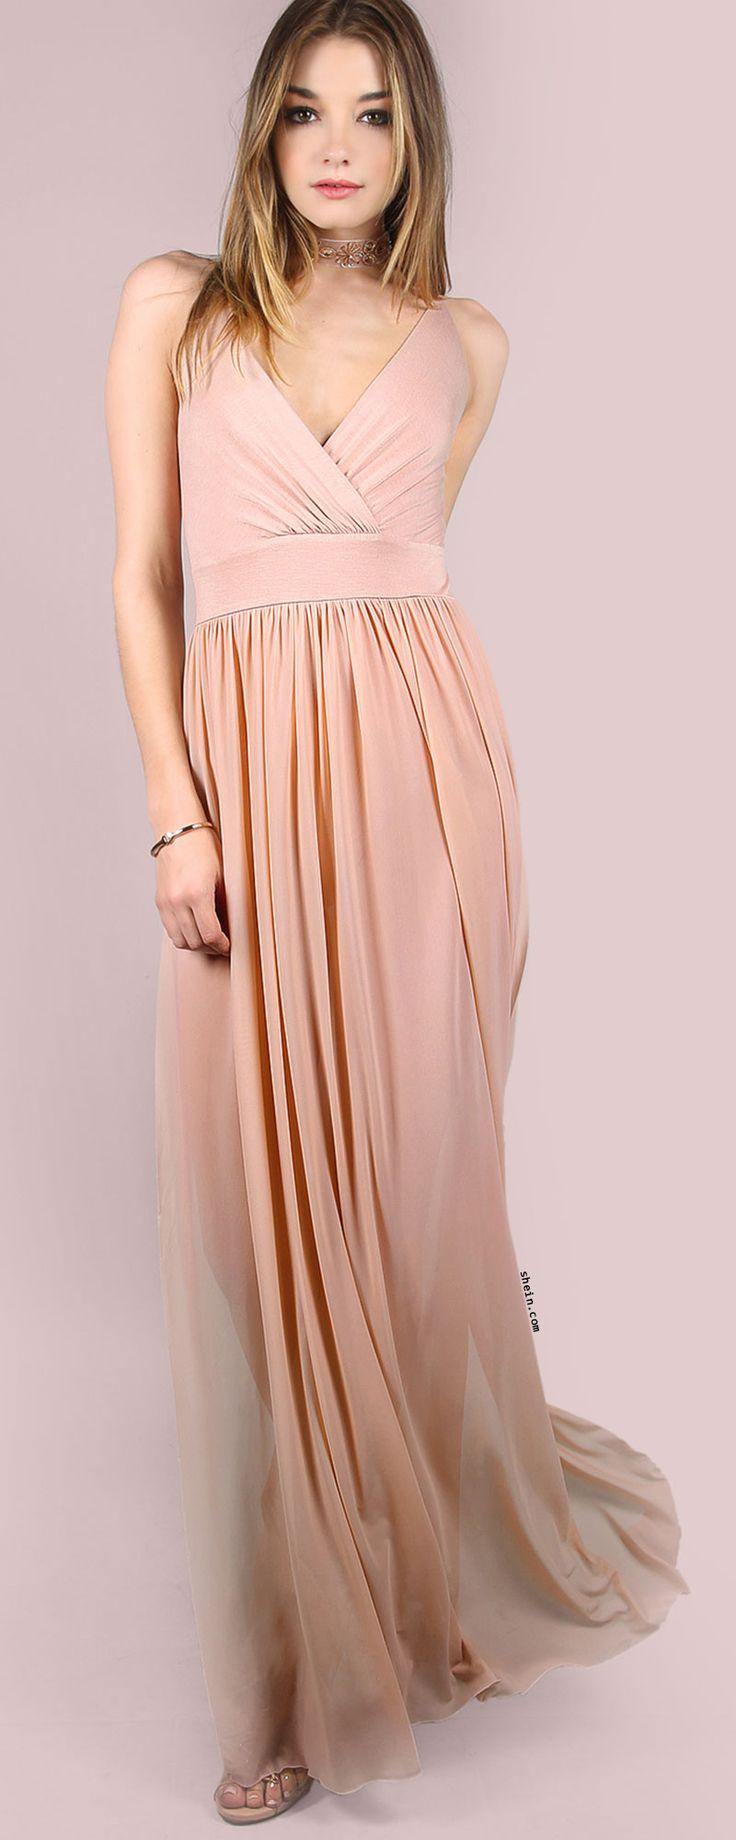 10 mejores imágenes sobre Dream Dresses en Pinterest | Encaje ...